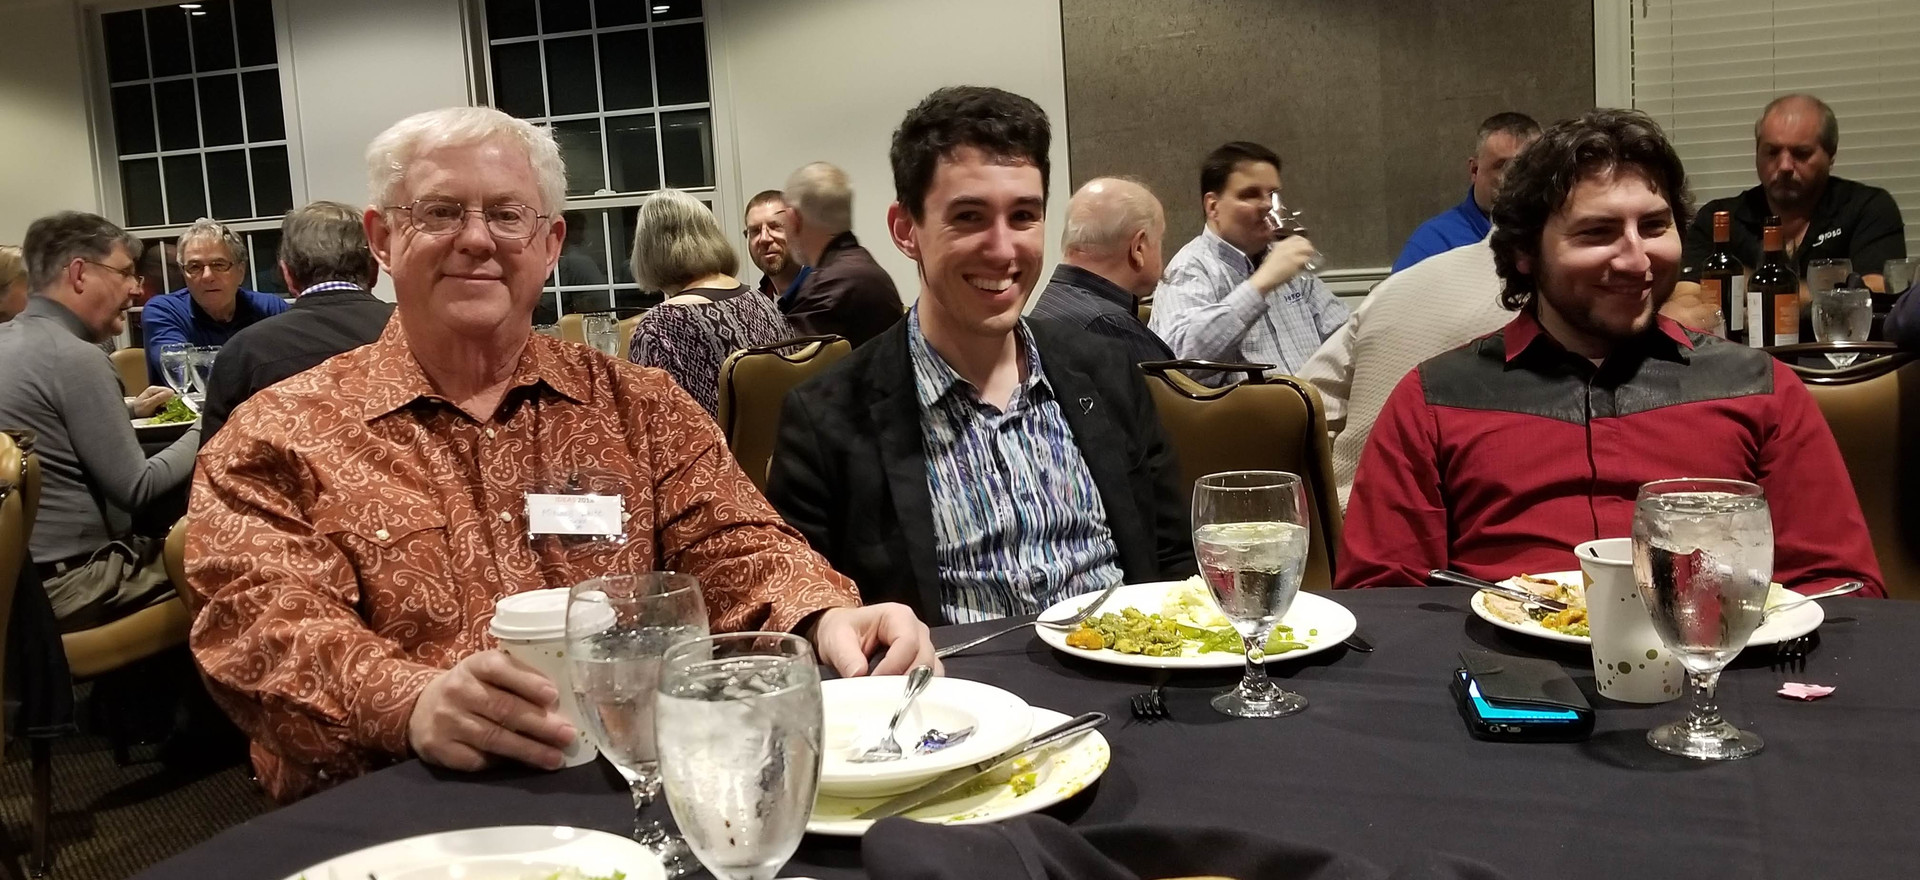 Mitchell White, Michael Bridge, & Cory Pesaturo